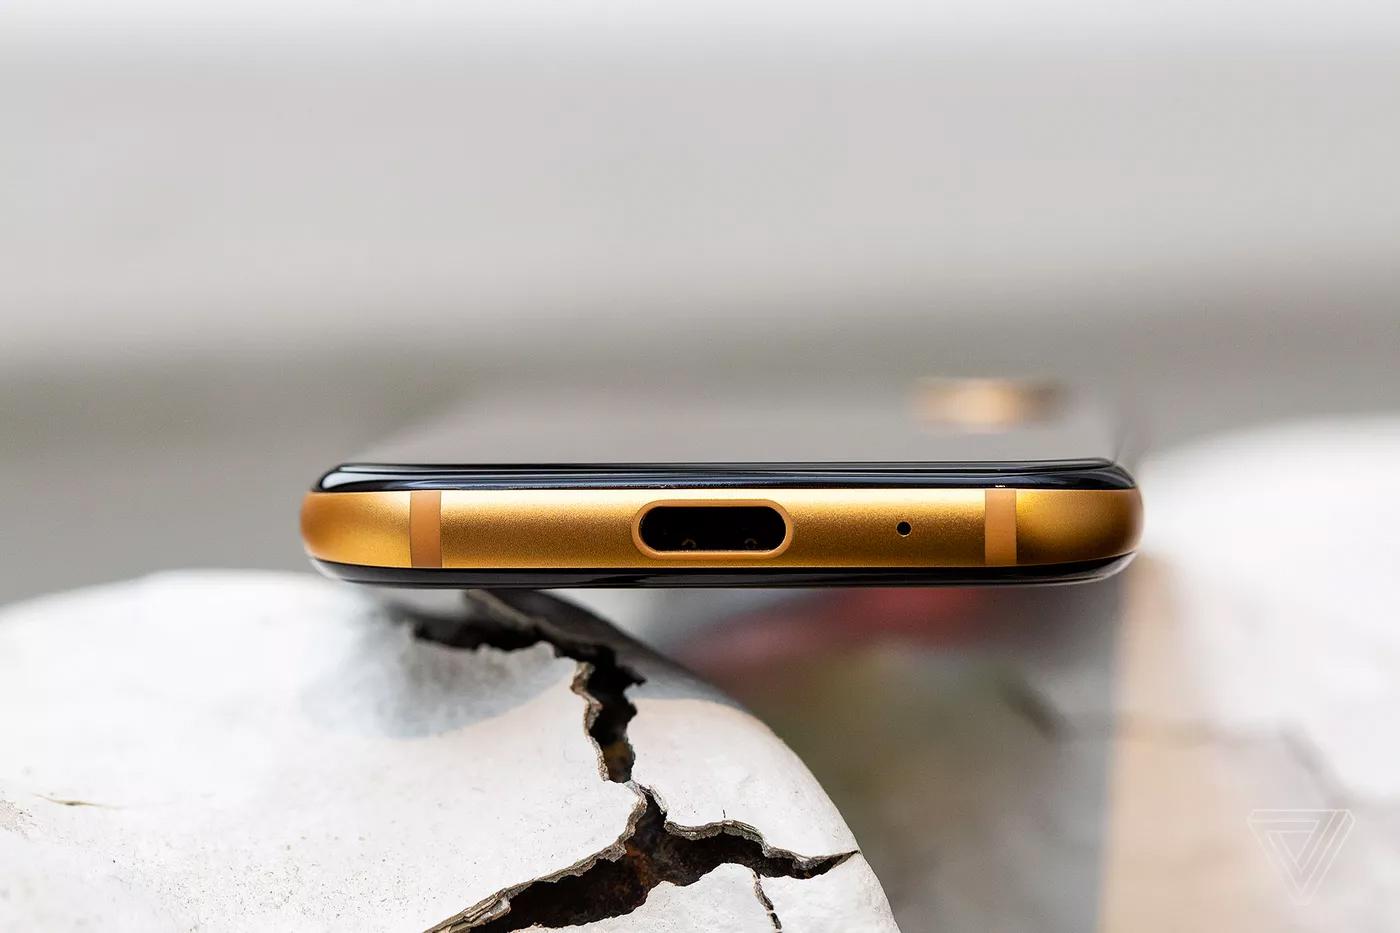 Palm вернулась нарынок стрехдюймовым смартфоном-компаньоном